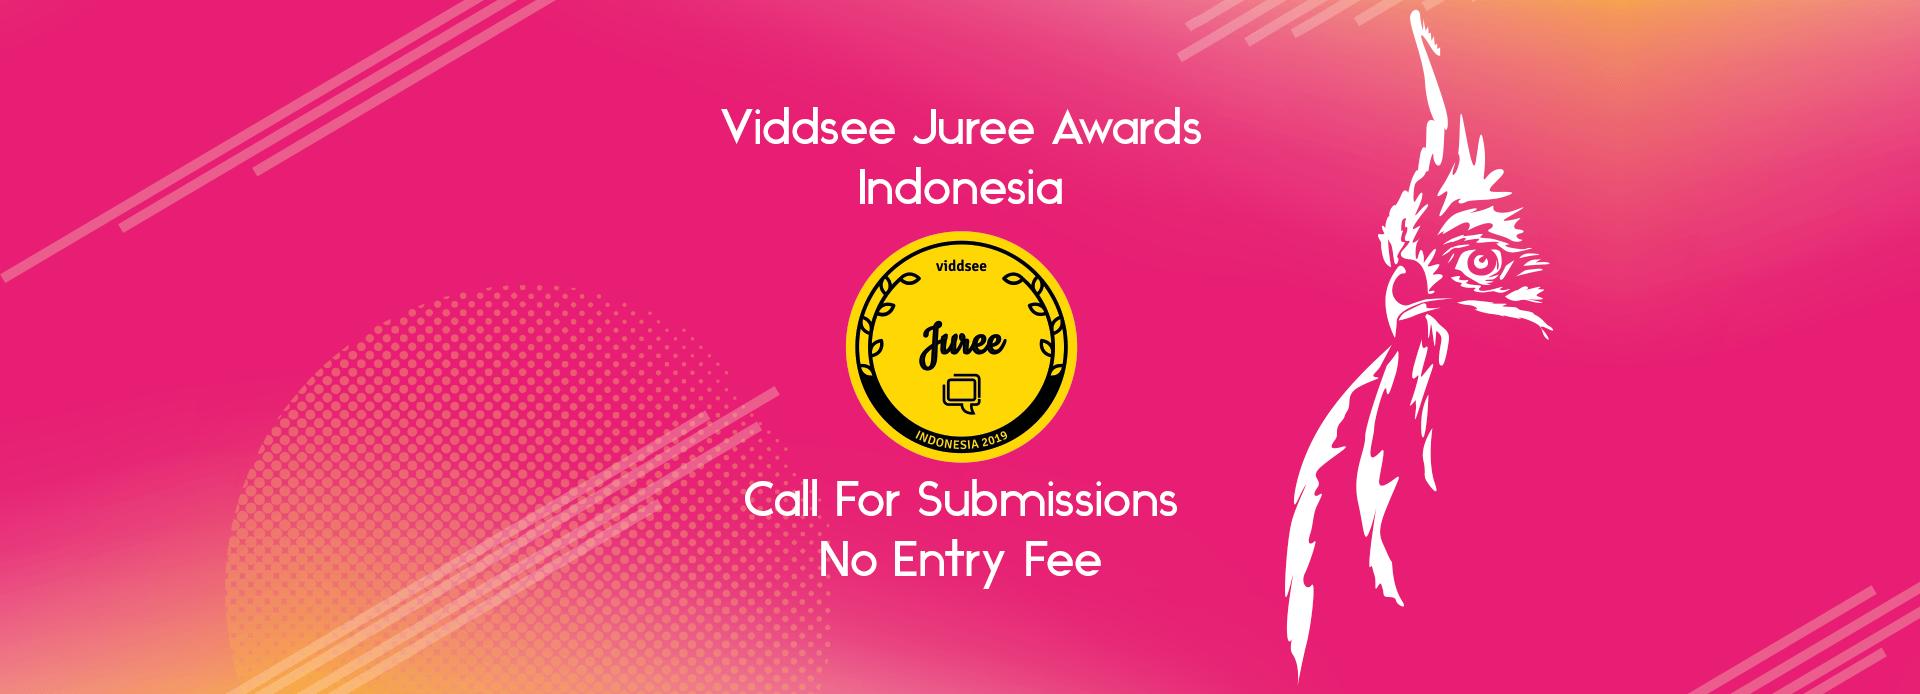 Viddsee Juree Indonesia 2019 Submissions Guidelines | Viddsee